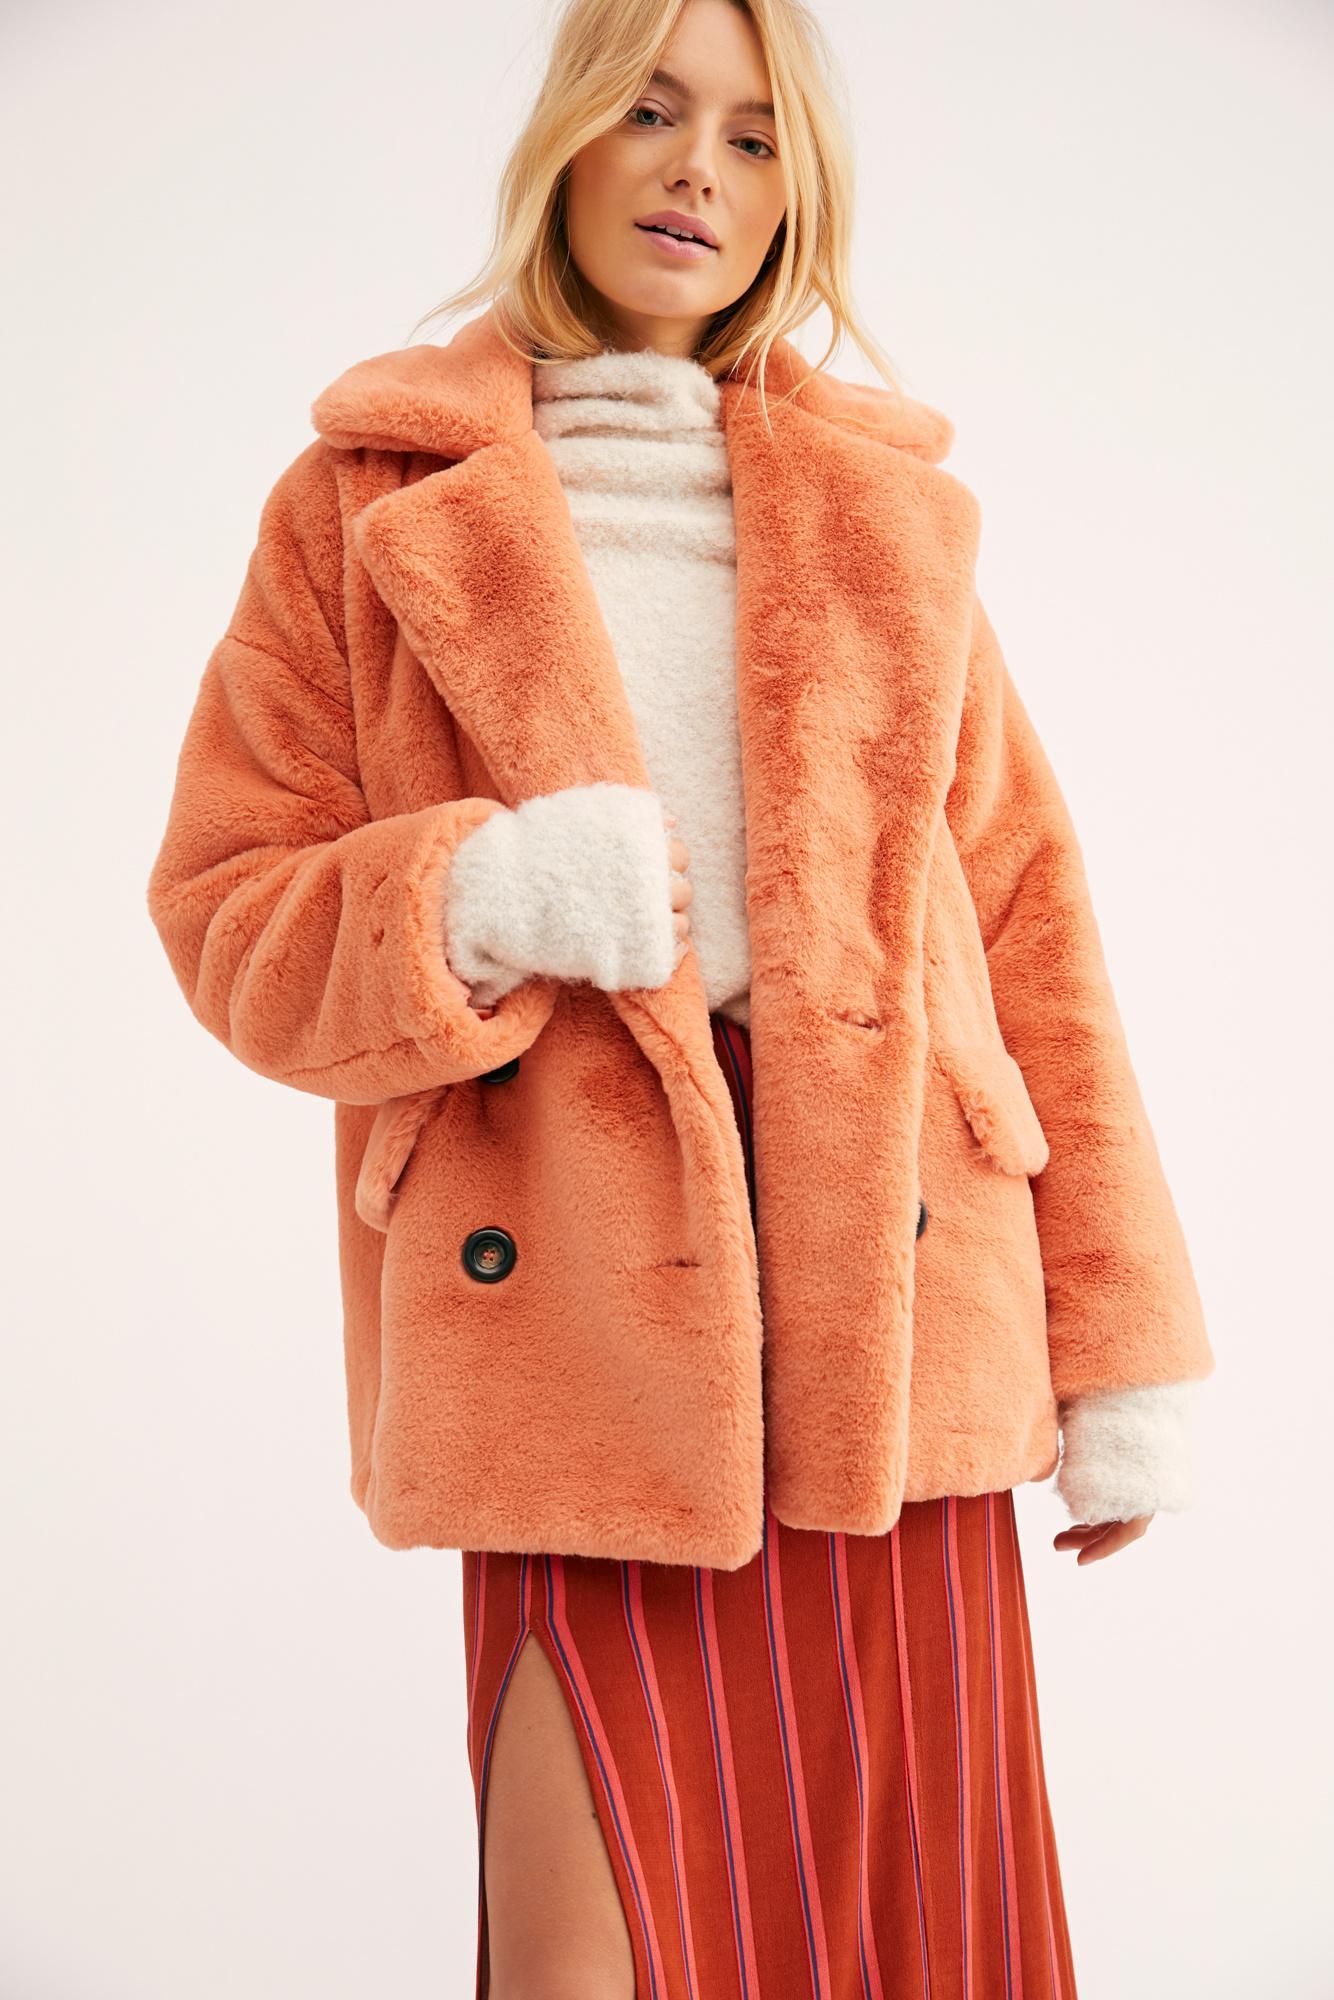 eb881f16d993 Lyst - Free People Solid Kate Faux Fur Coat in Orange